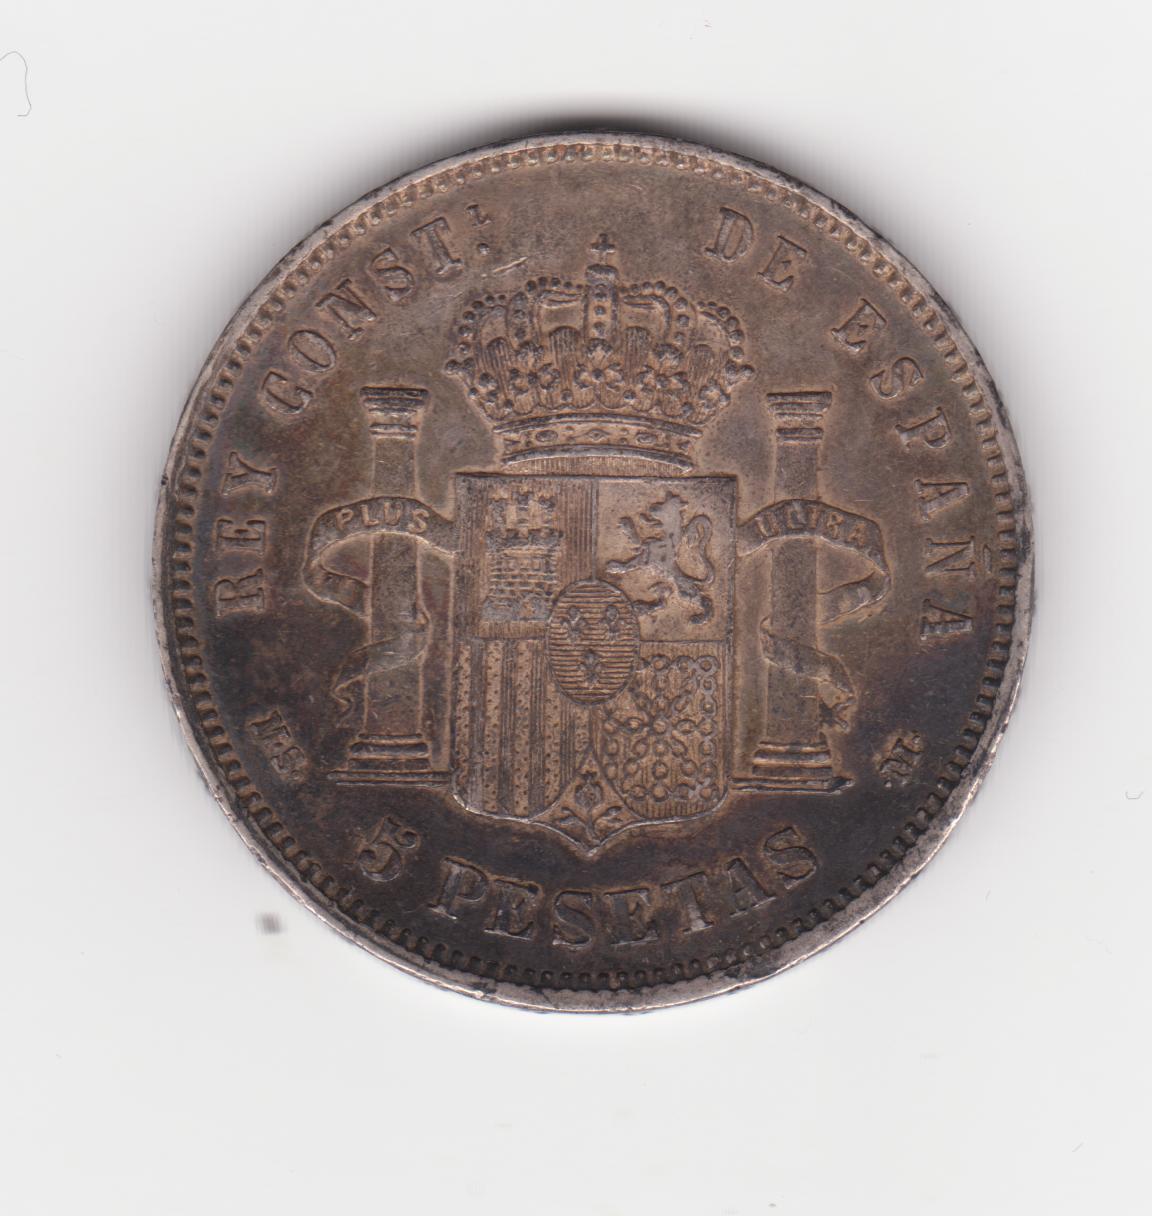 5 pesetas 1885 18*86*, Alfonso XII 5_pesetas_1885_001